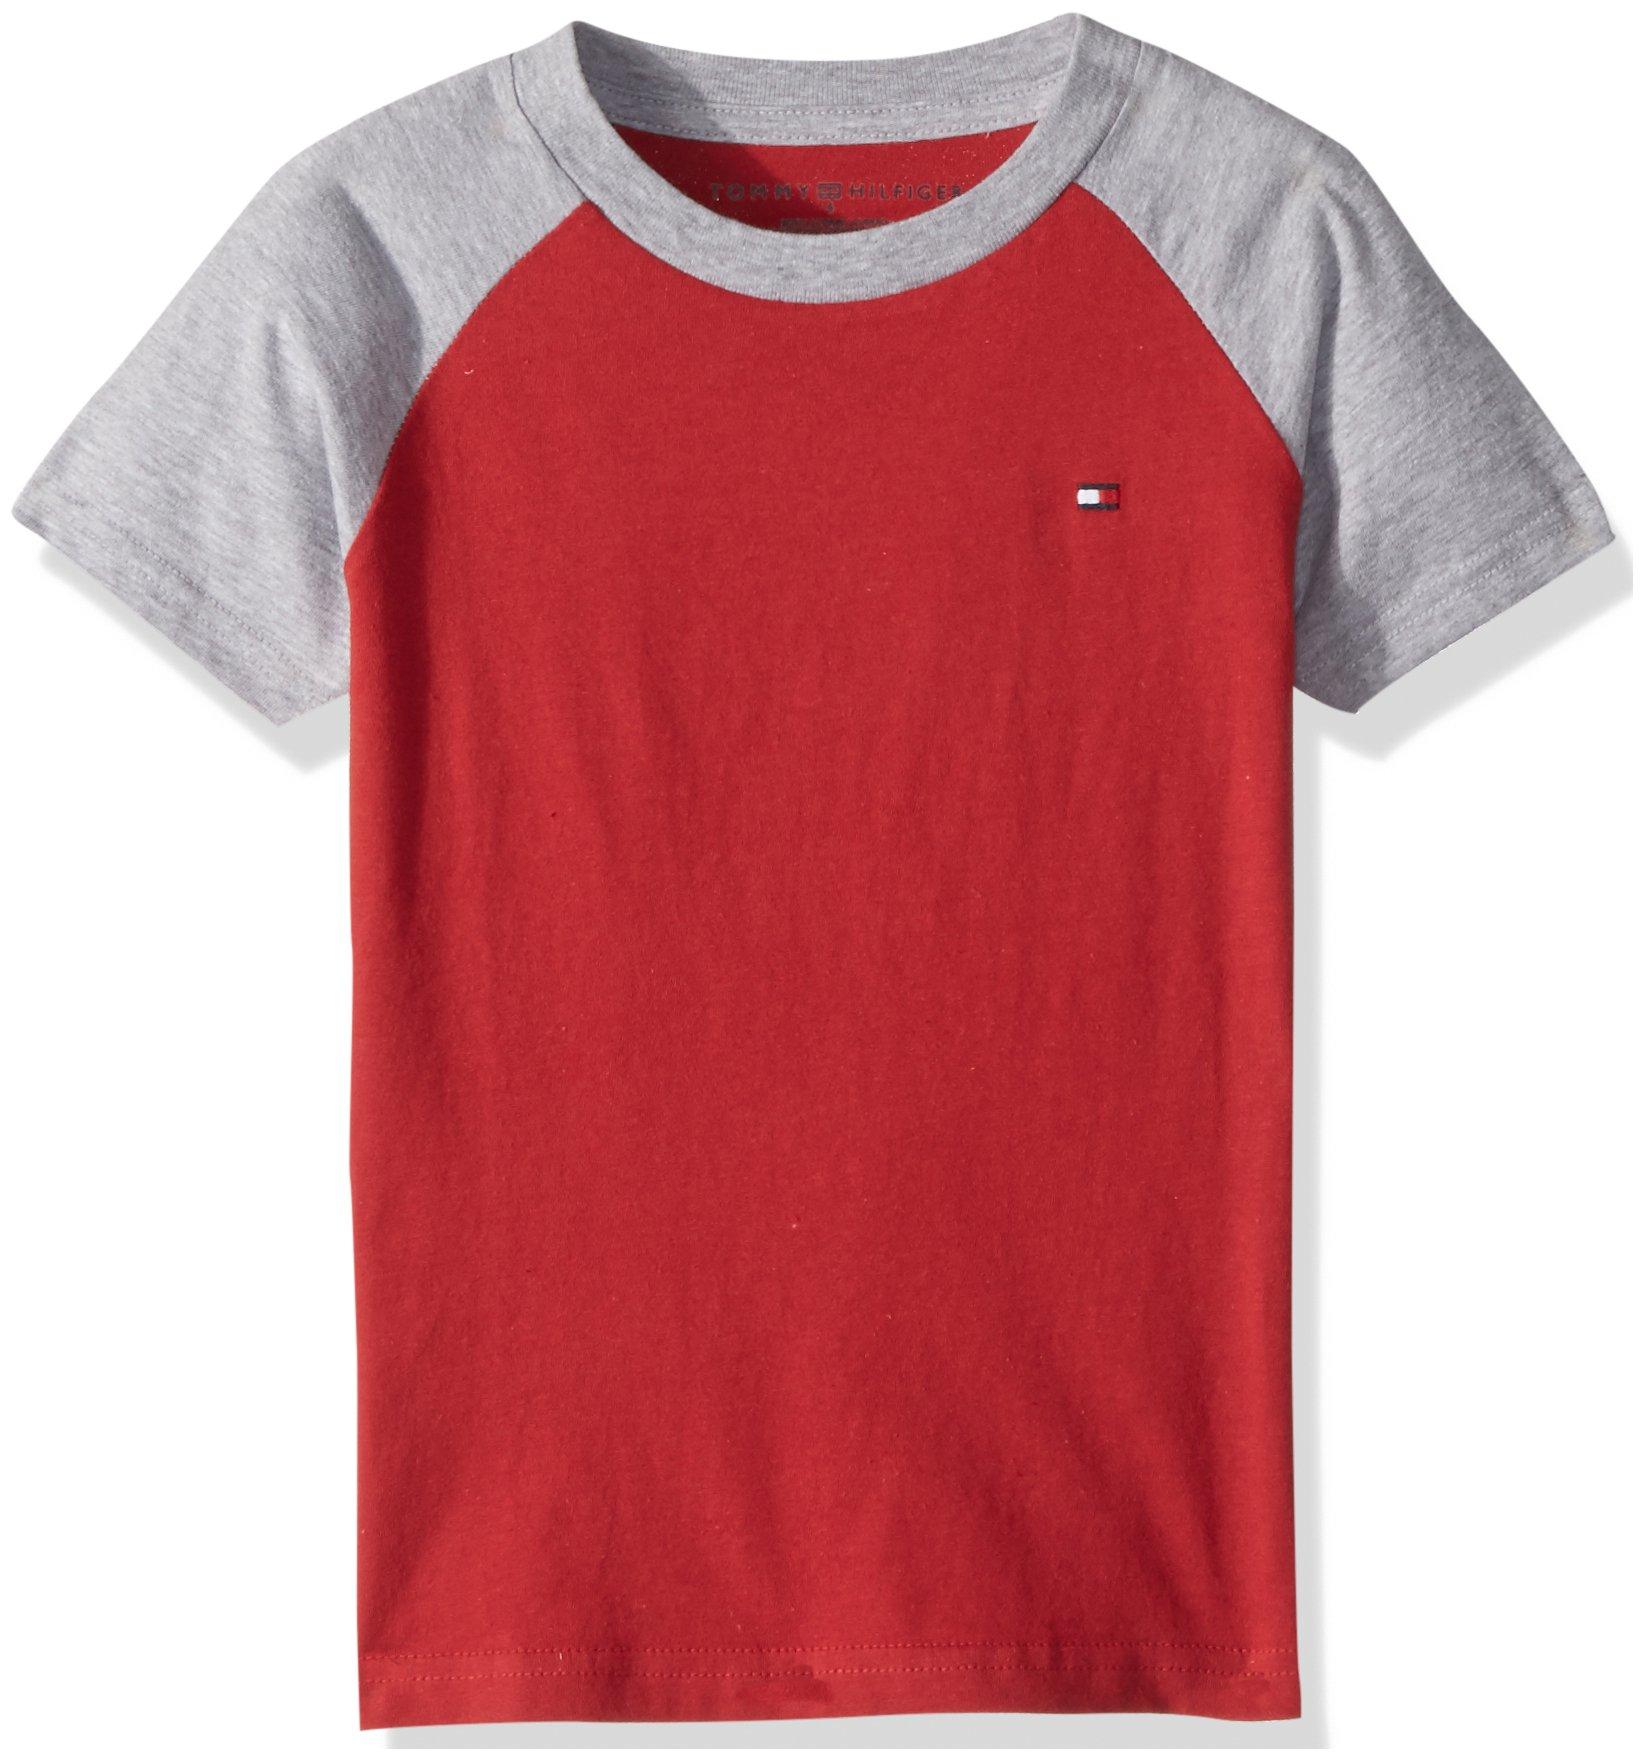 98cd0e3a Galleon - Tommy Hilfiger Boys' Big Short Sleeve Raglan T-Shirt, Regal Red,  Medium